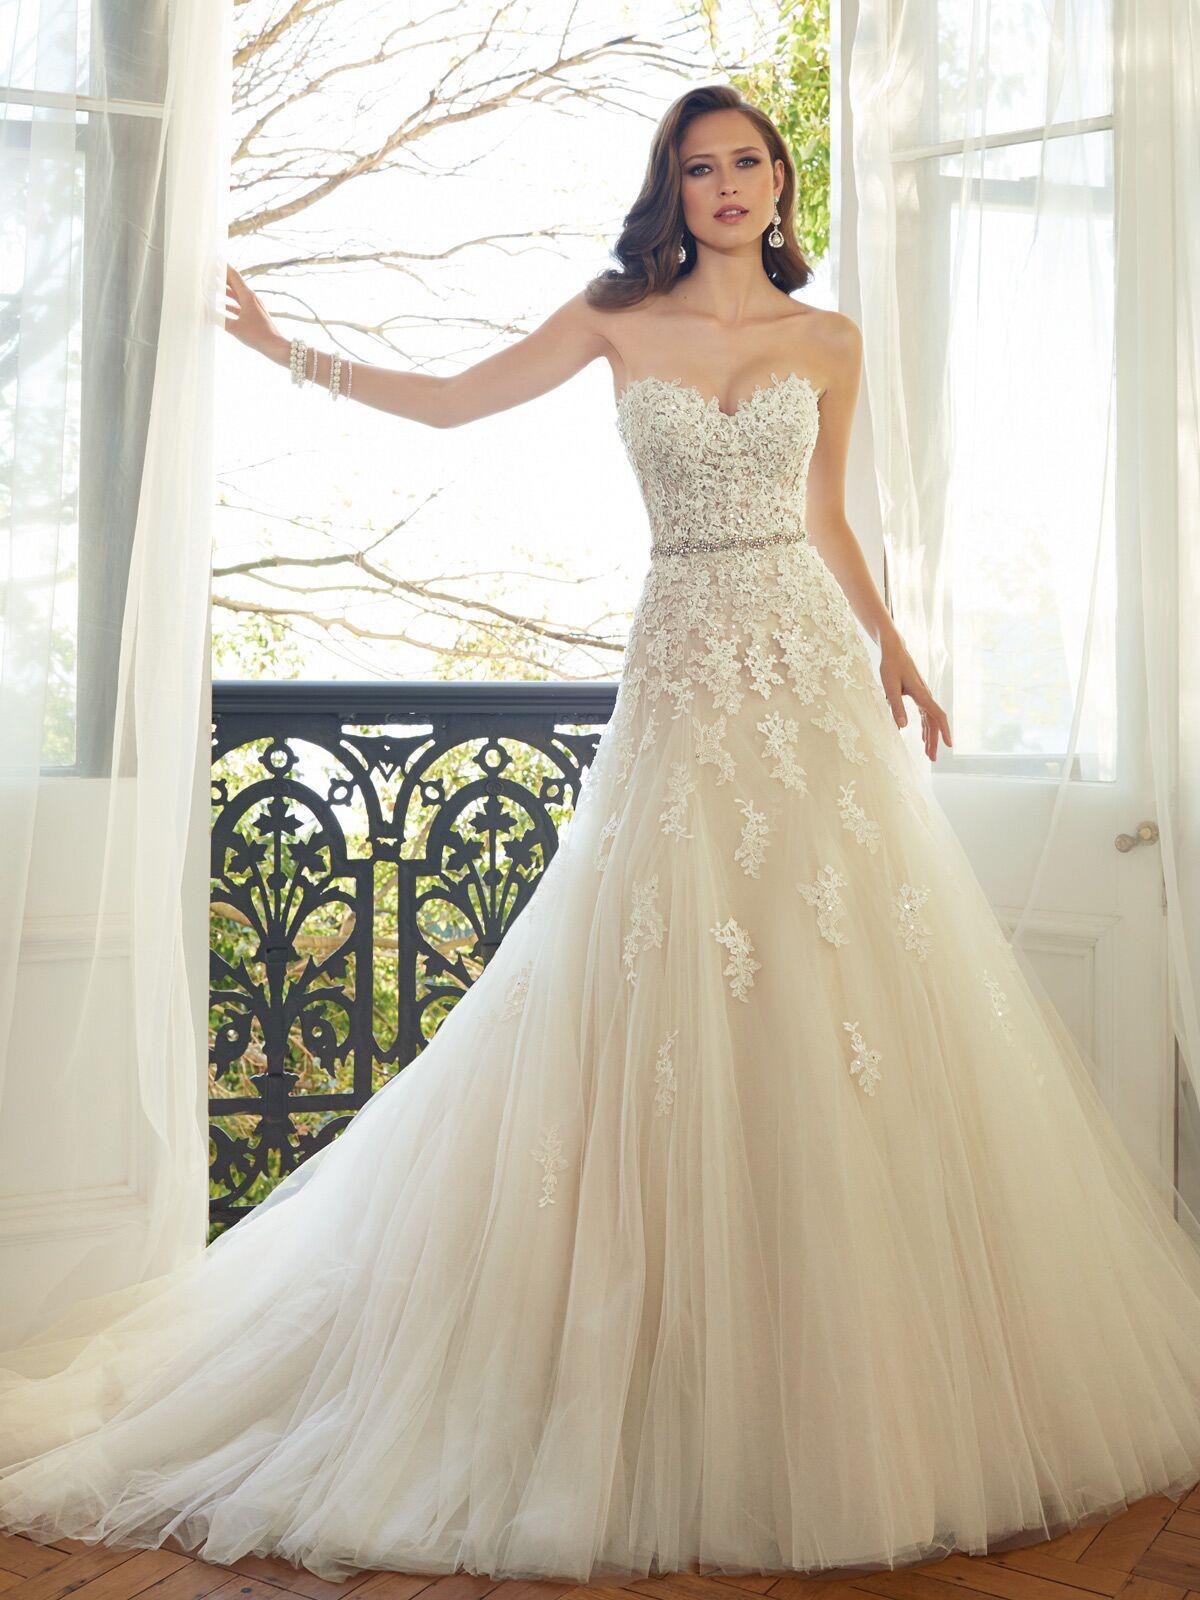 Amara Bridal Boutique - West Chester, OH